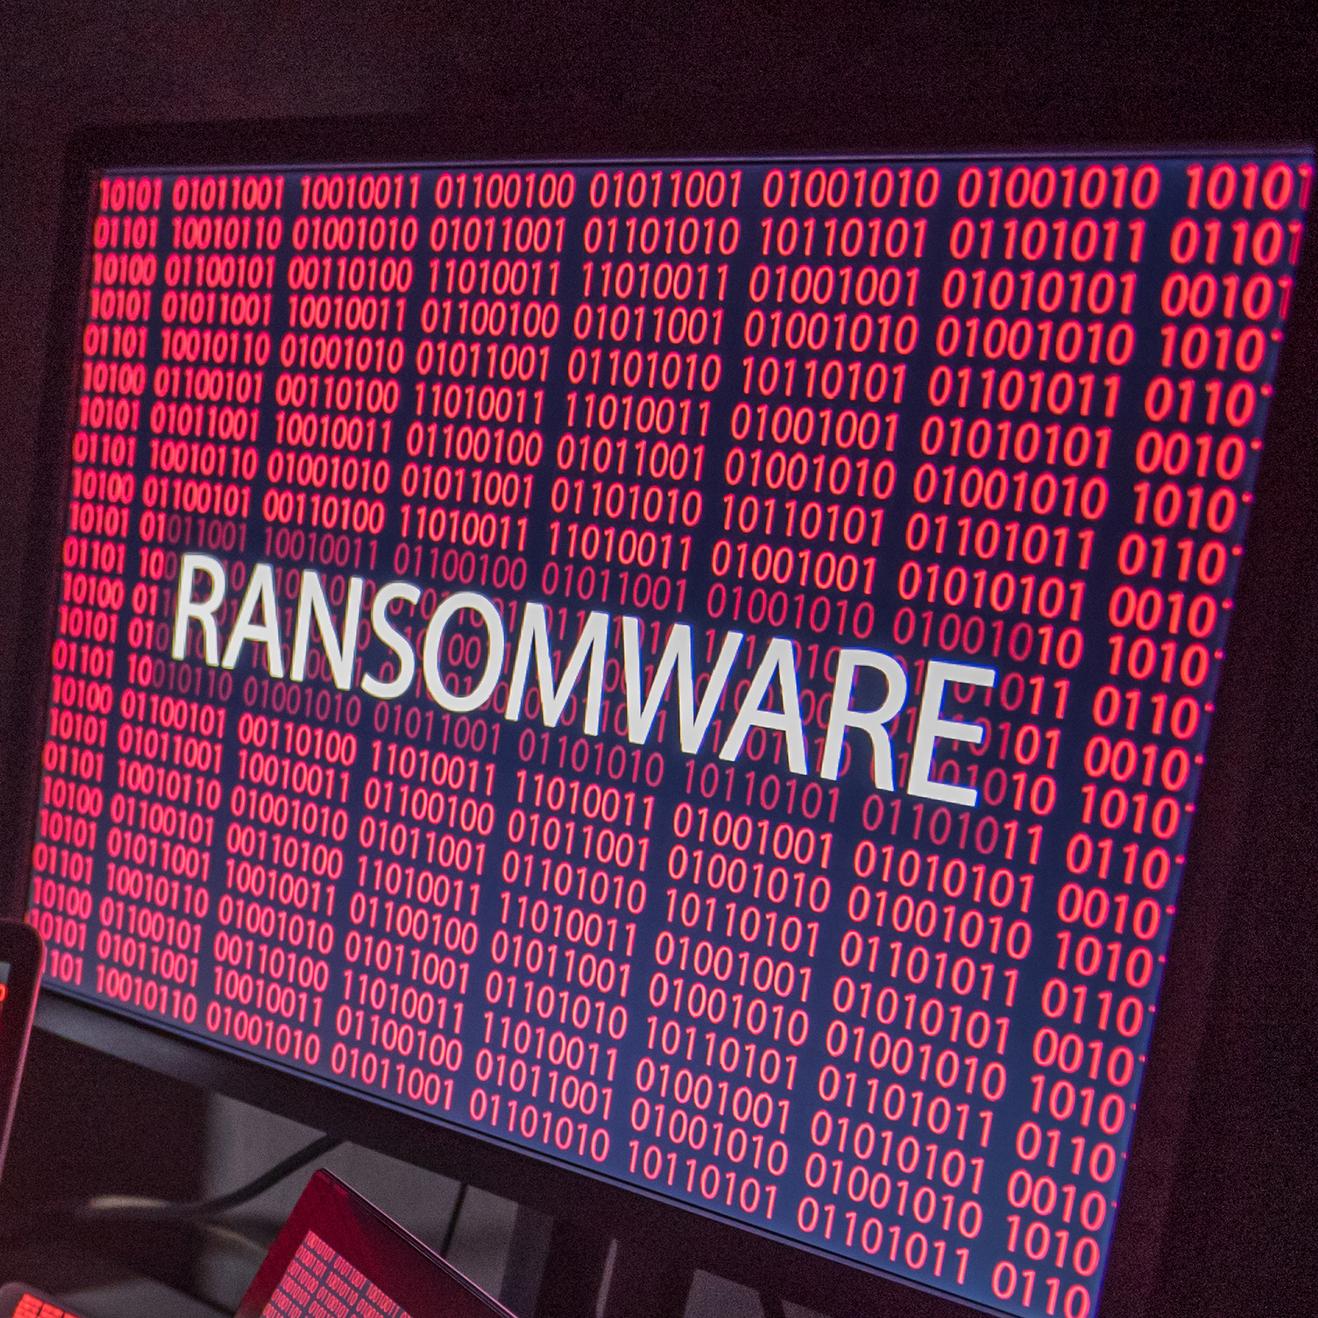 Ransomware (1)